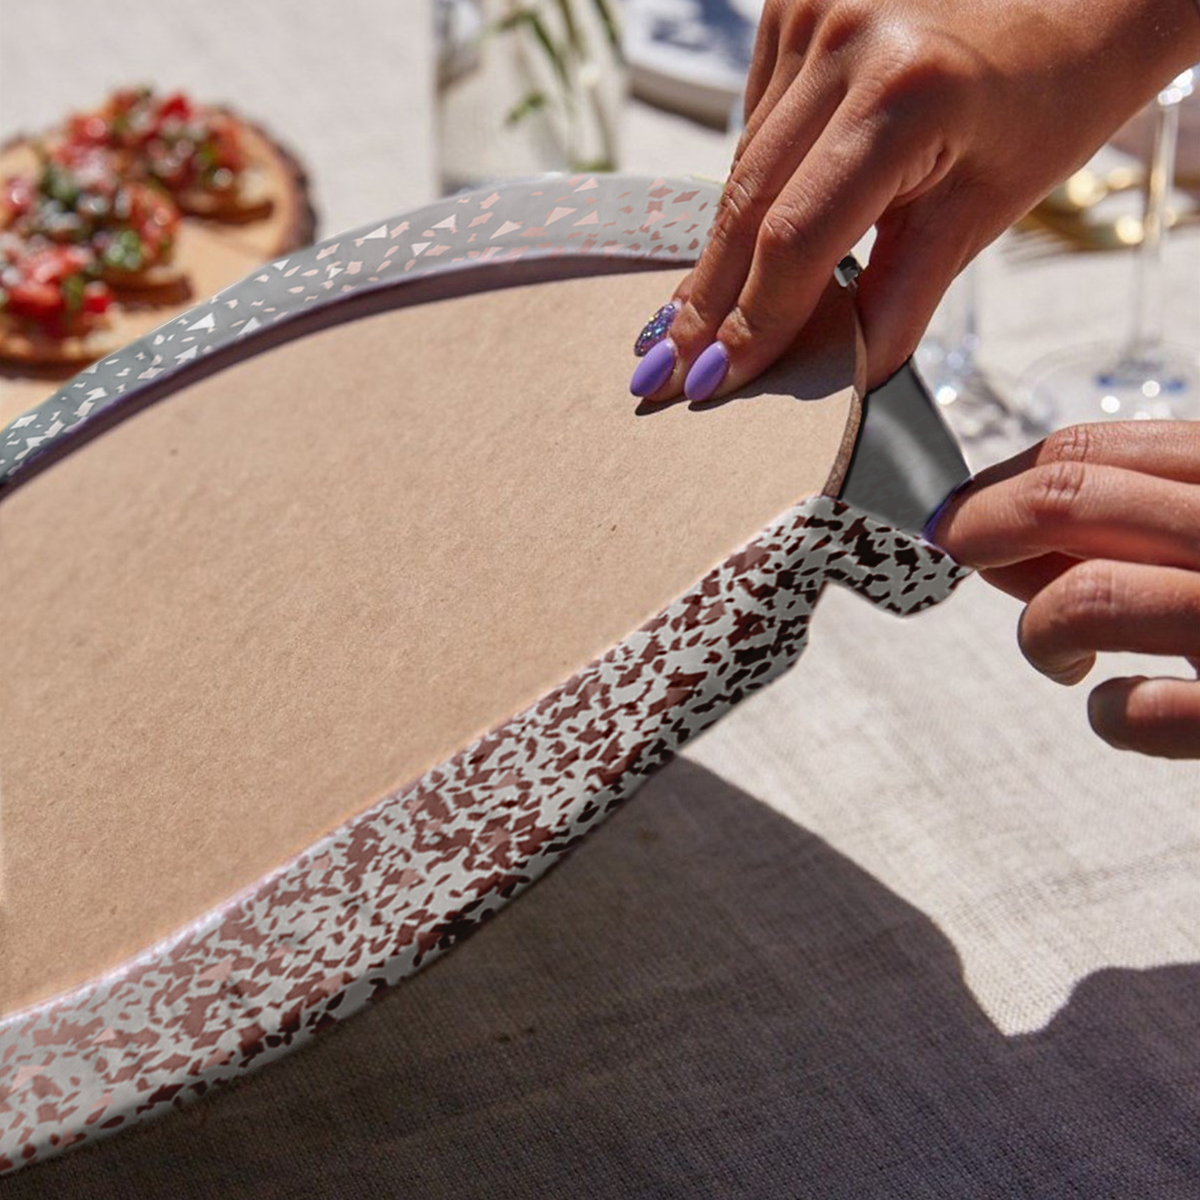 6'lı Pastel Renkli Soyut Özel Tasarımlı Servis Altlığı & Supla Realhomes